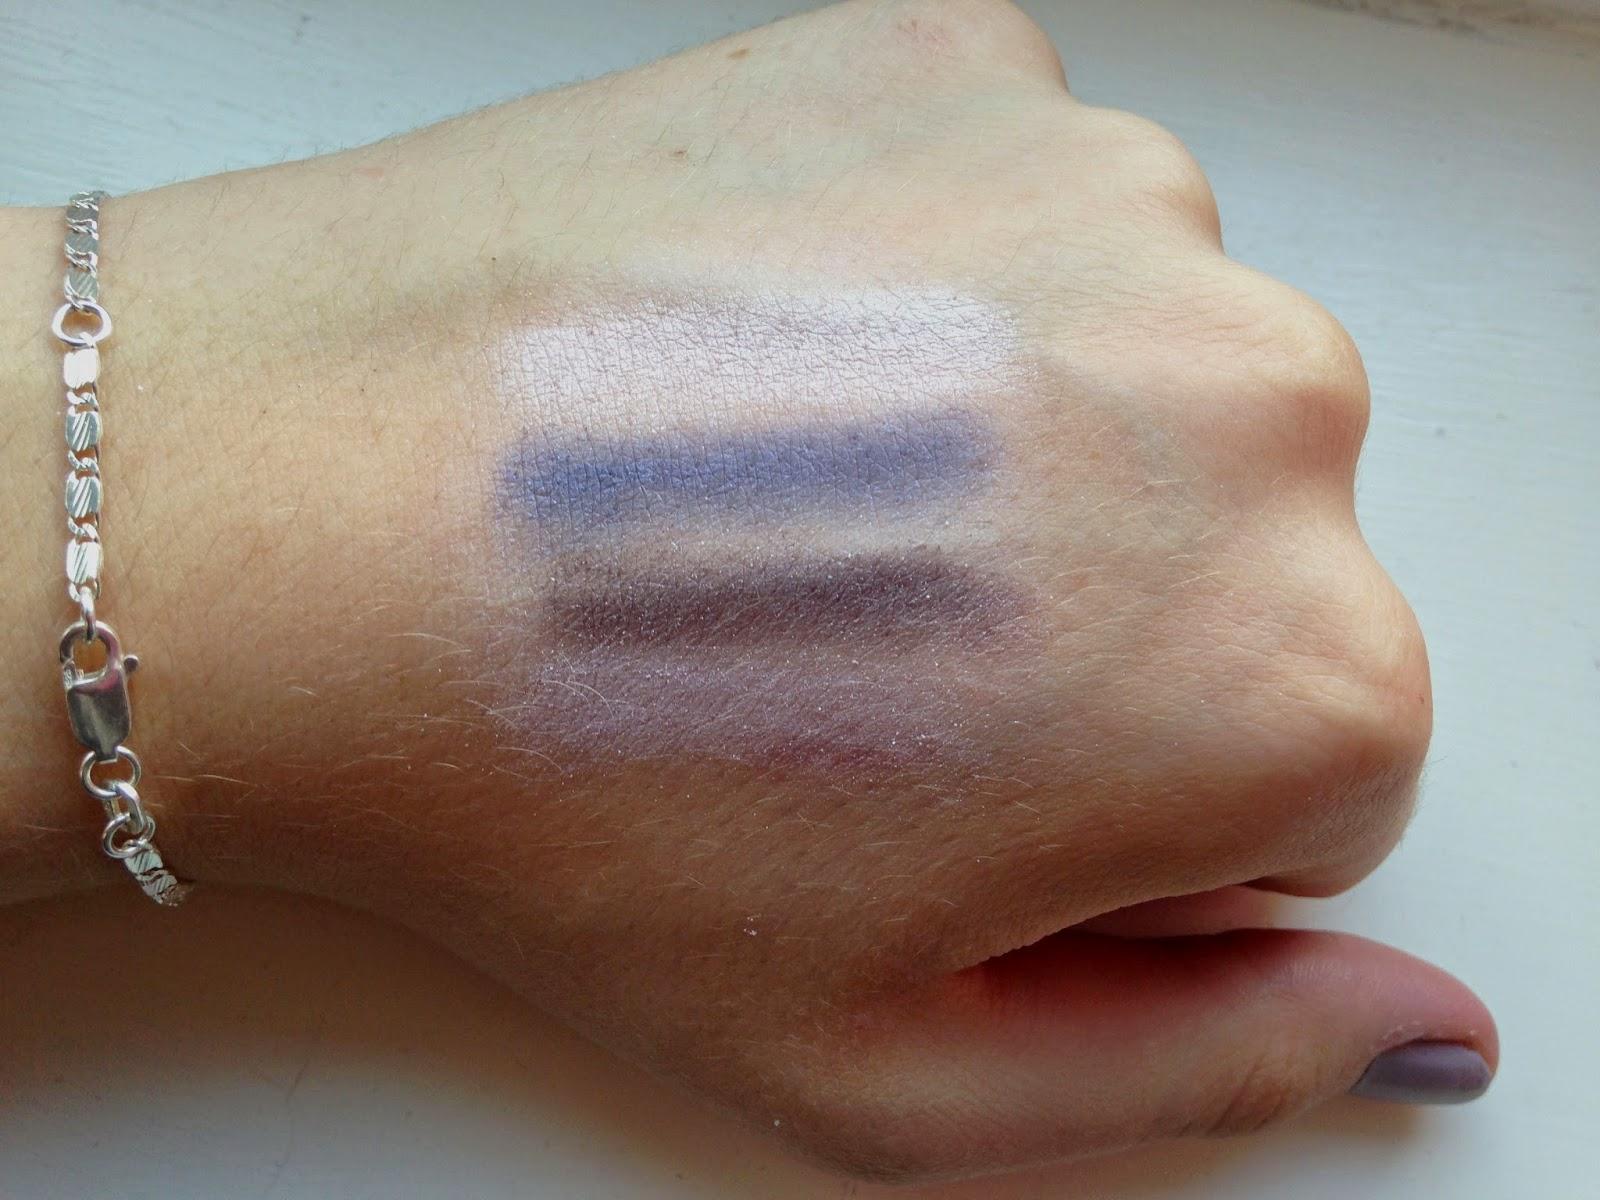 ELF Brightening Eye Colour Palette Silver Lining